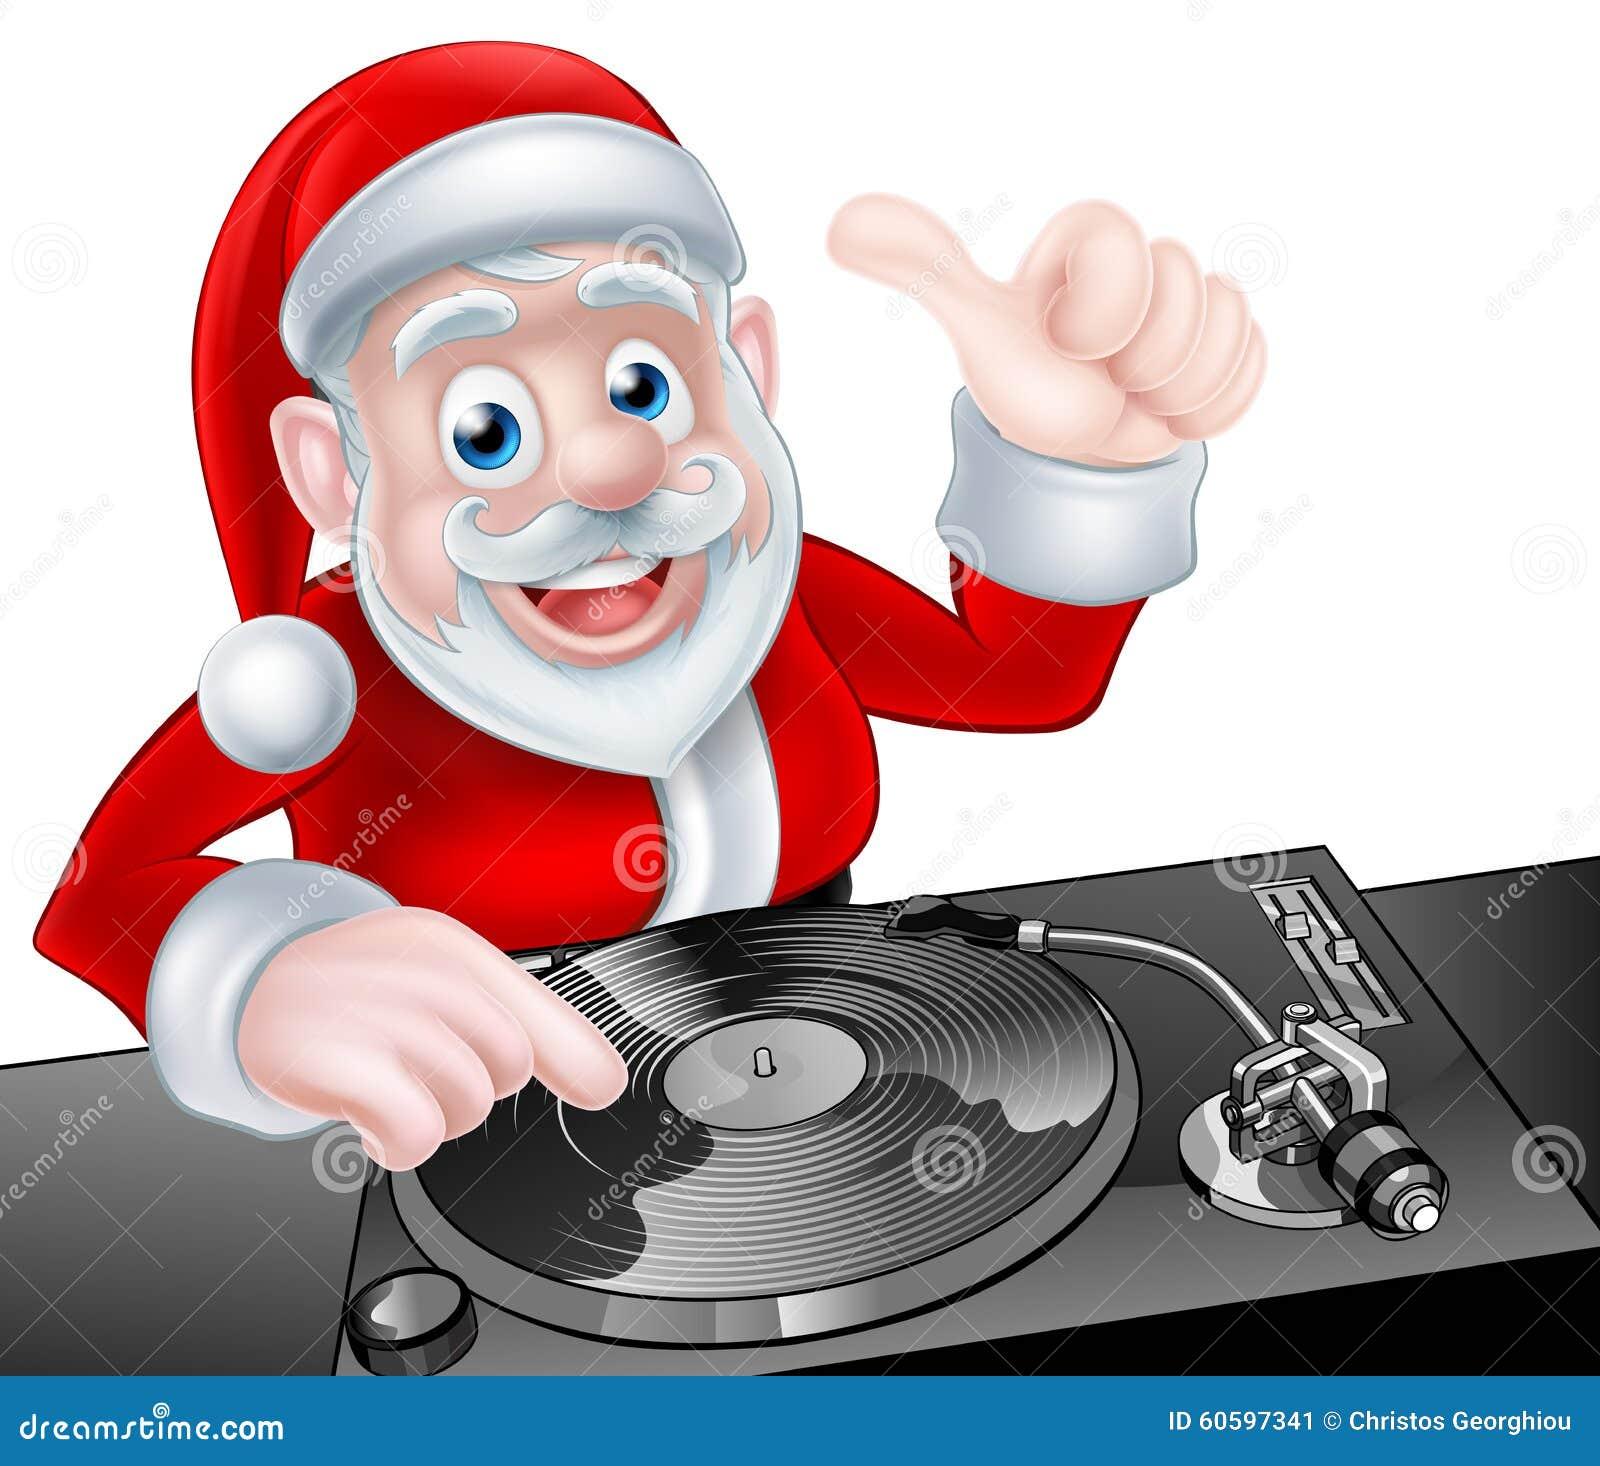 DJ Santa Cartoon Stock Vector - Image: 60597341